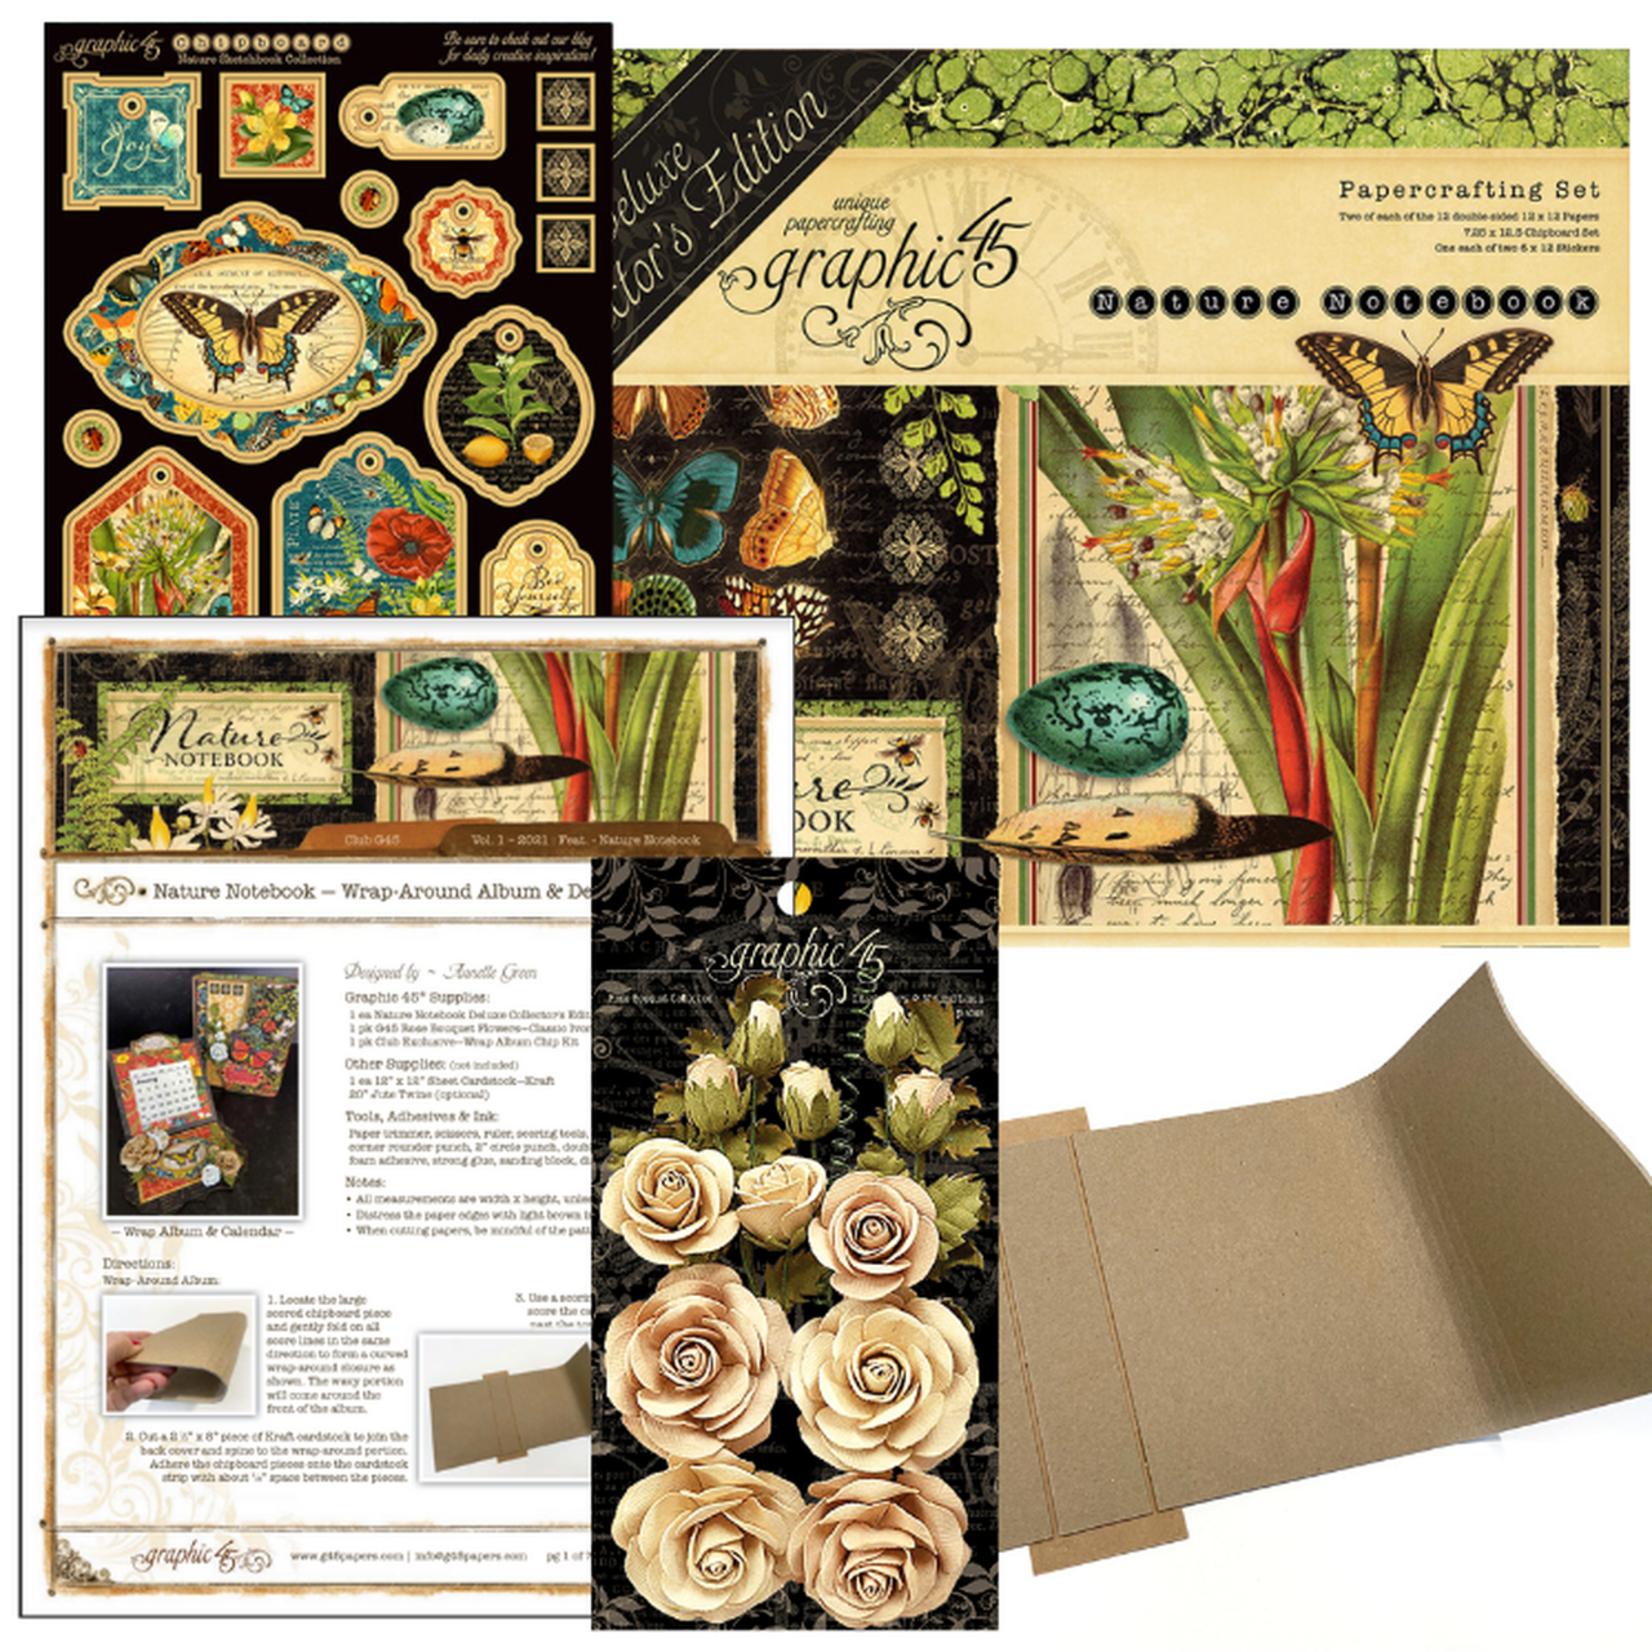 Graphic 45 Graphic 45 - Club45 - Nature Notebook -  Wrap-Arpund Album & Desktop Calendar